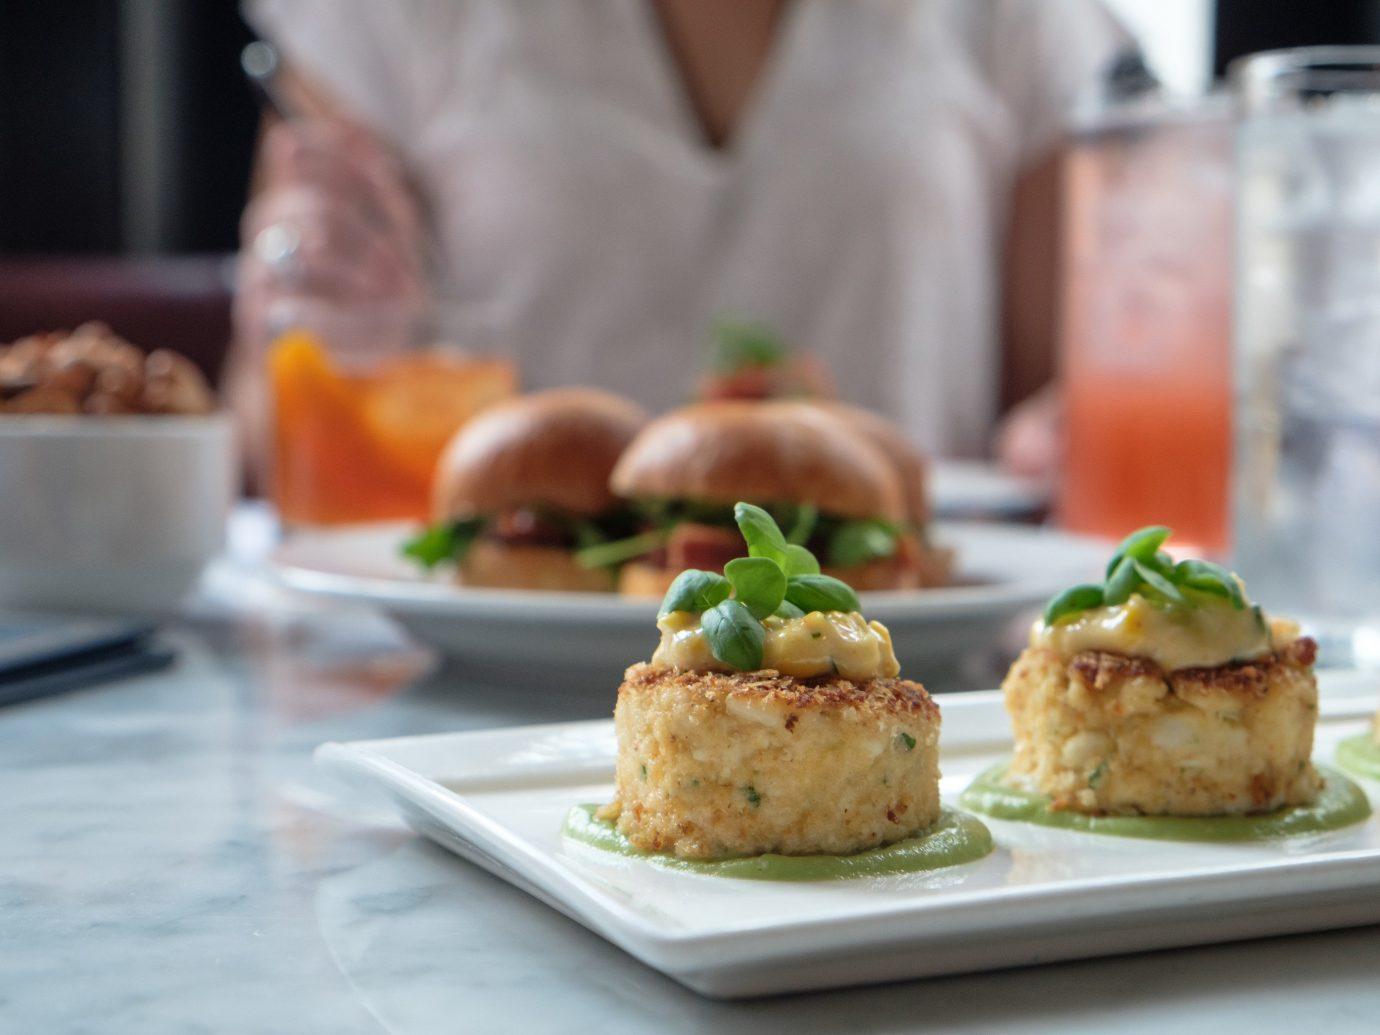 Arts + Culture Boutique Hotels City Jetsetter Guides person dish food appetizer vegetarian food cuisine finger food brunch hors d oeuvre meal breakfast